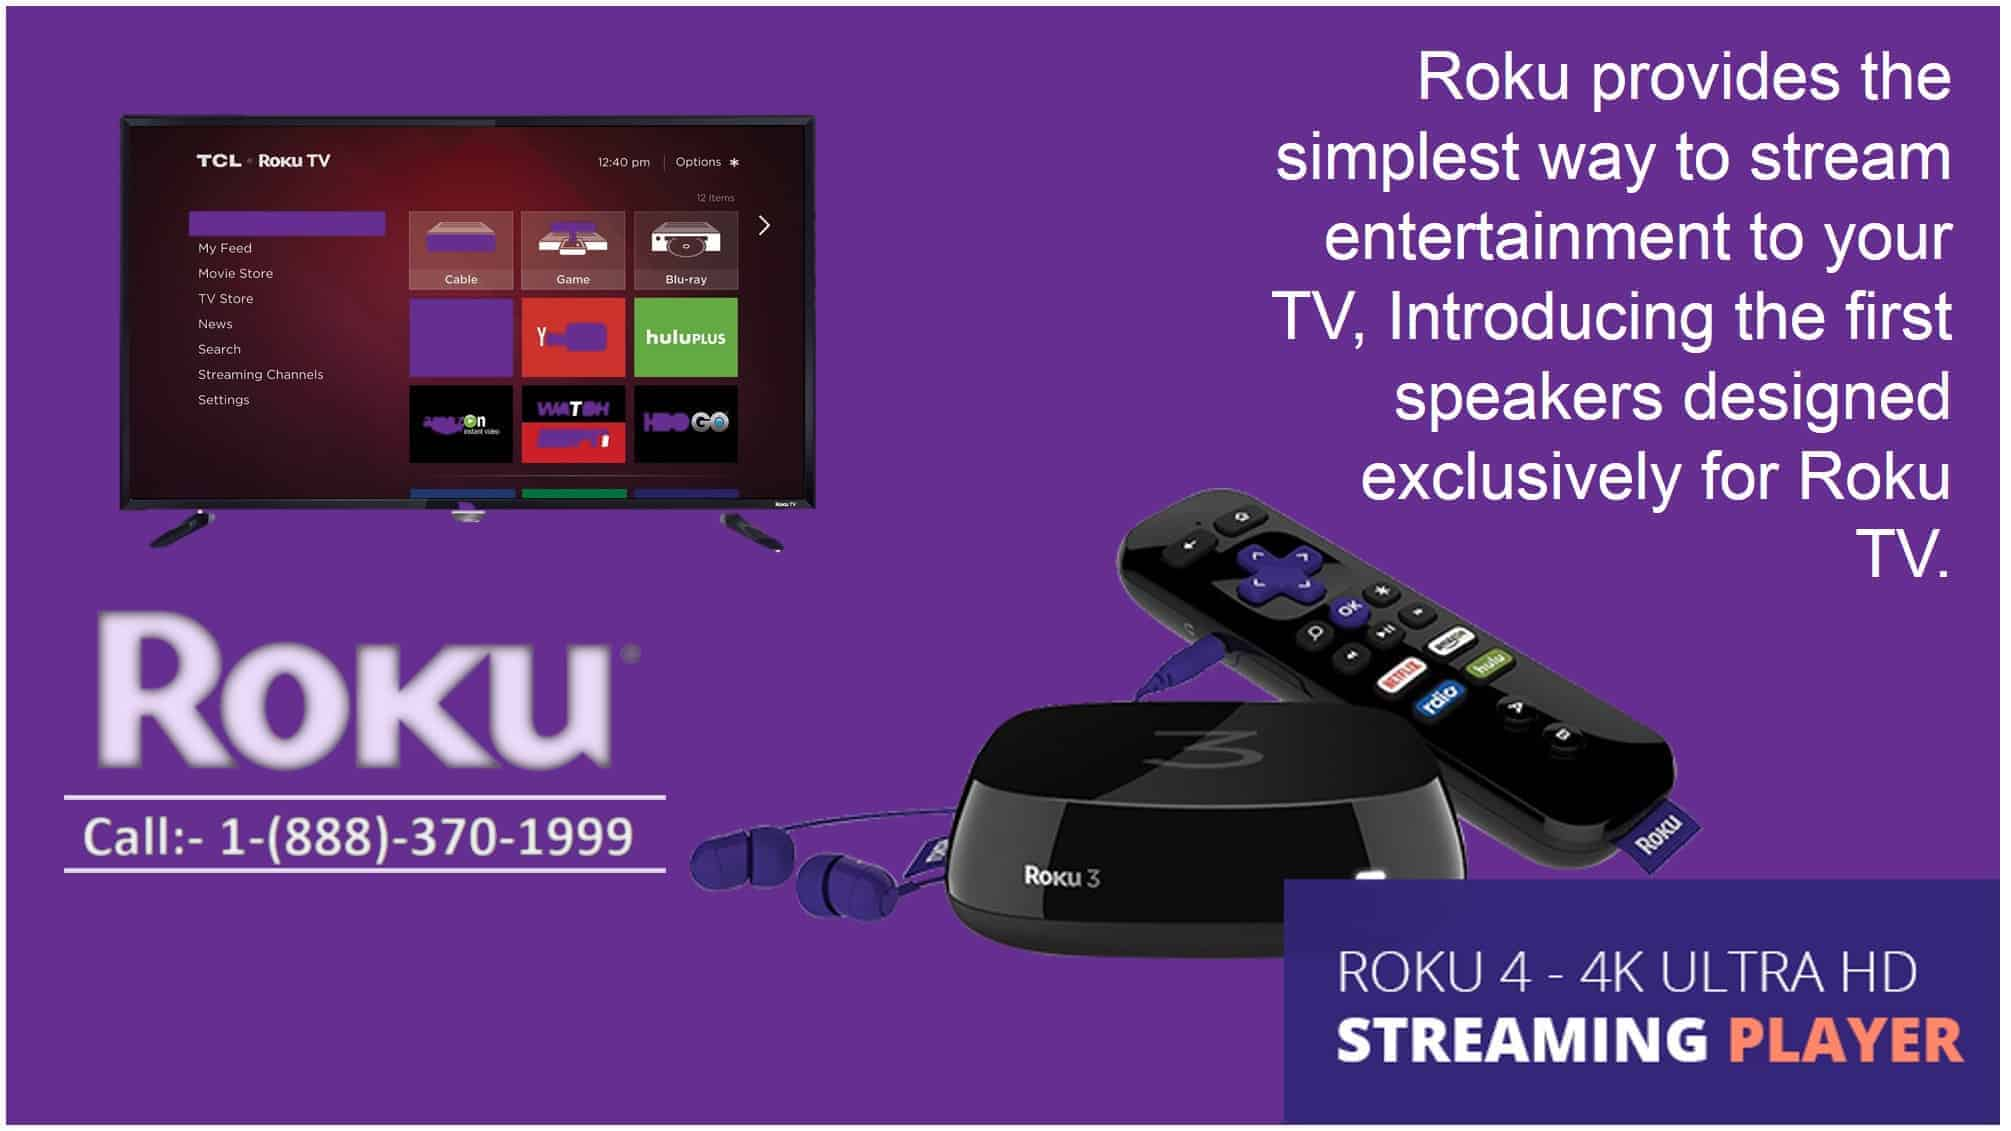 Roku customer support number